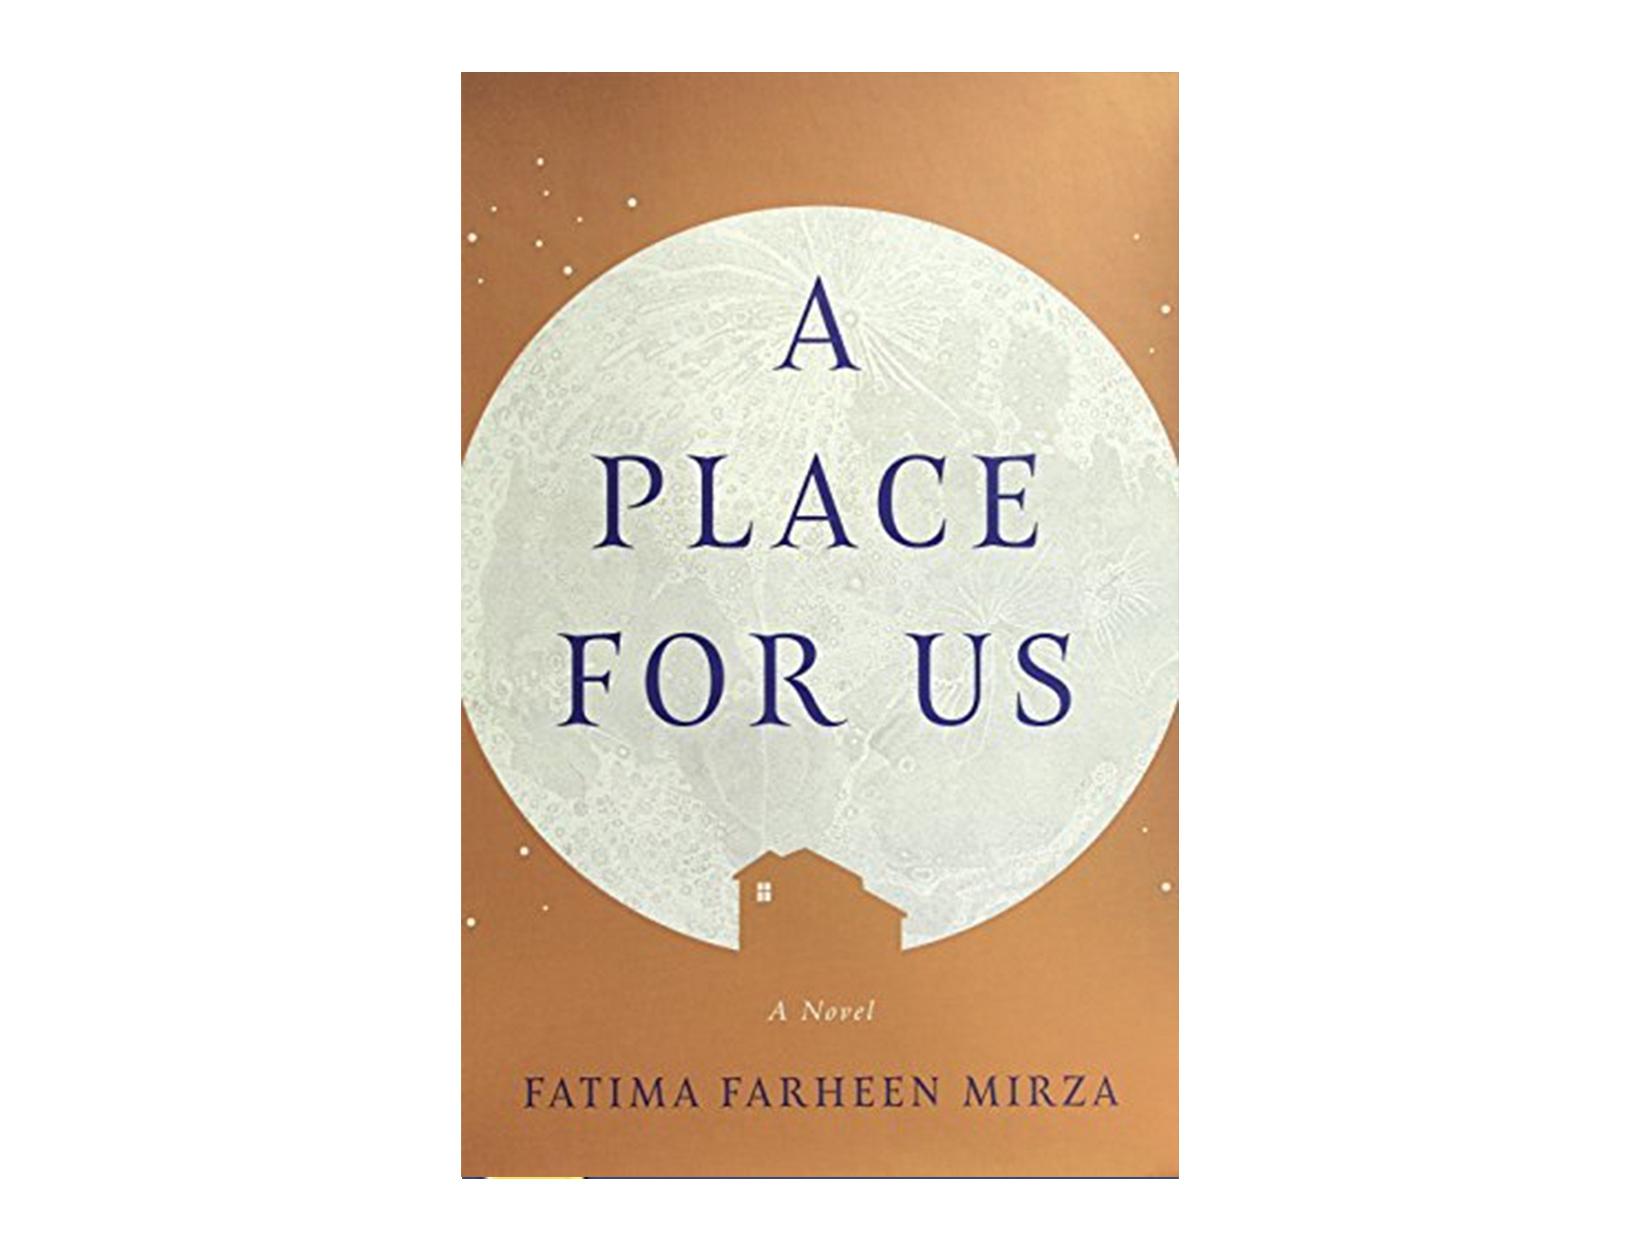 <em>A Place for Us</em> by Fatima Farheen Mirza